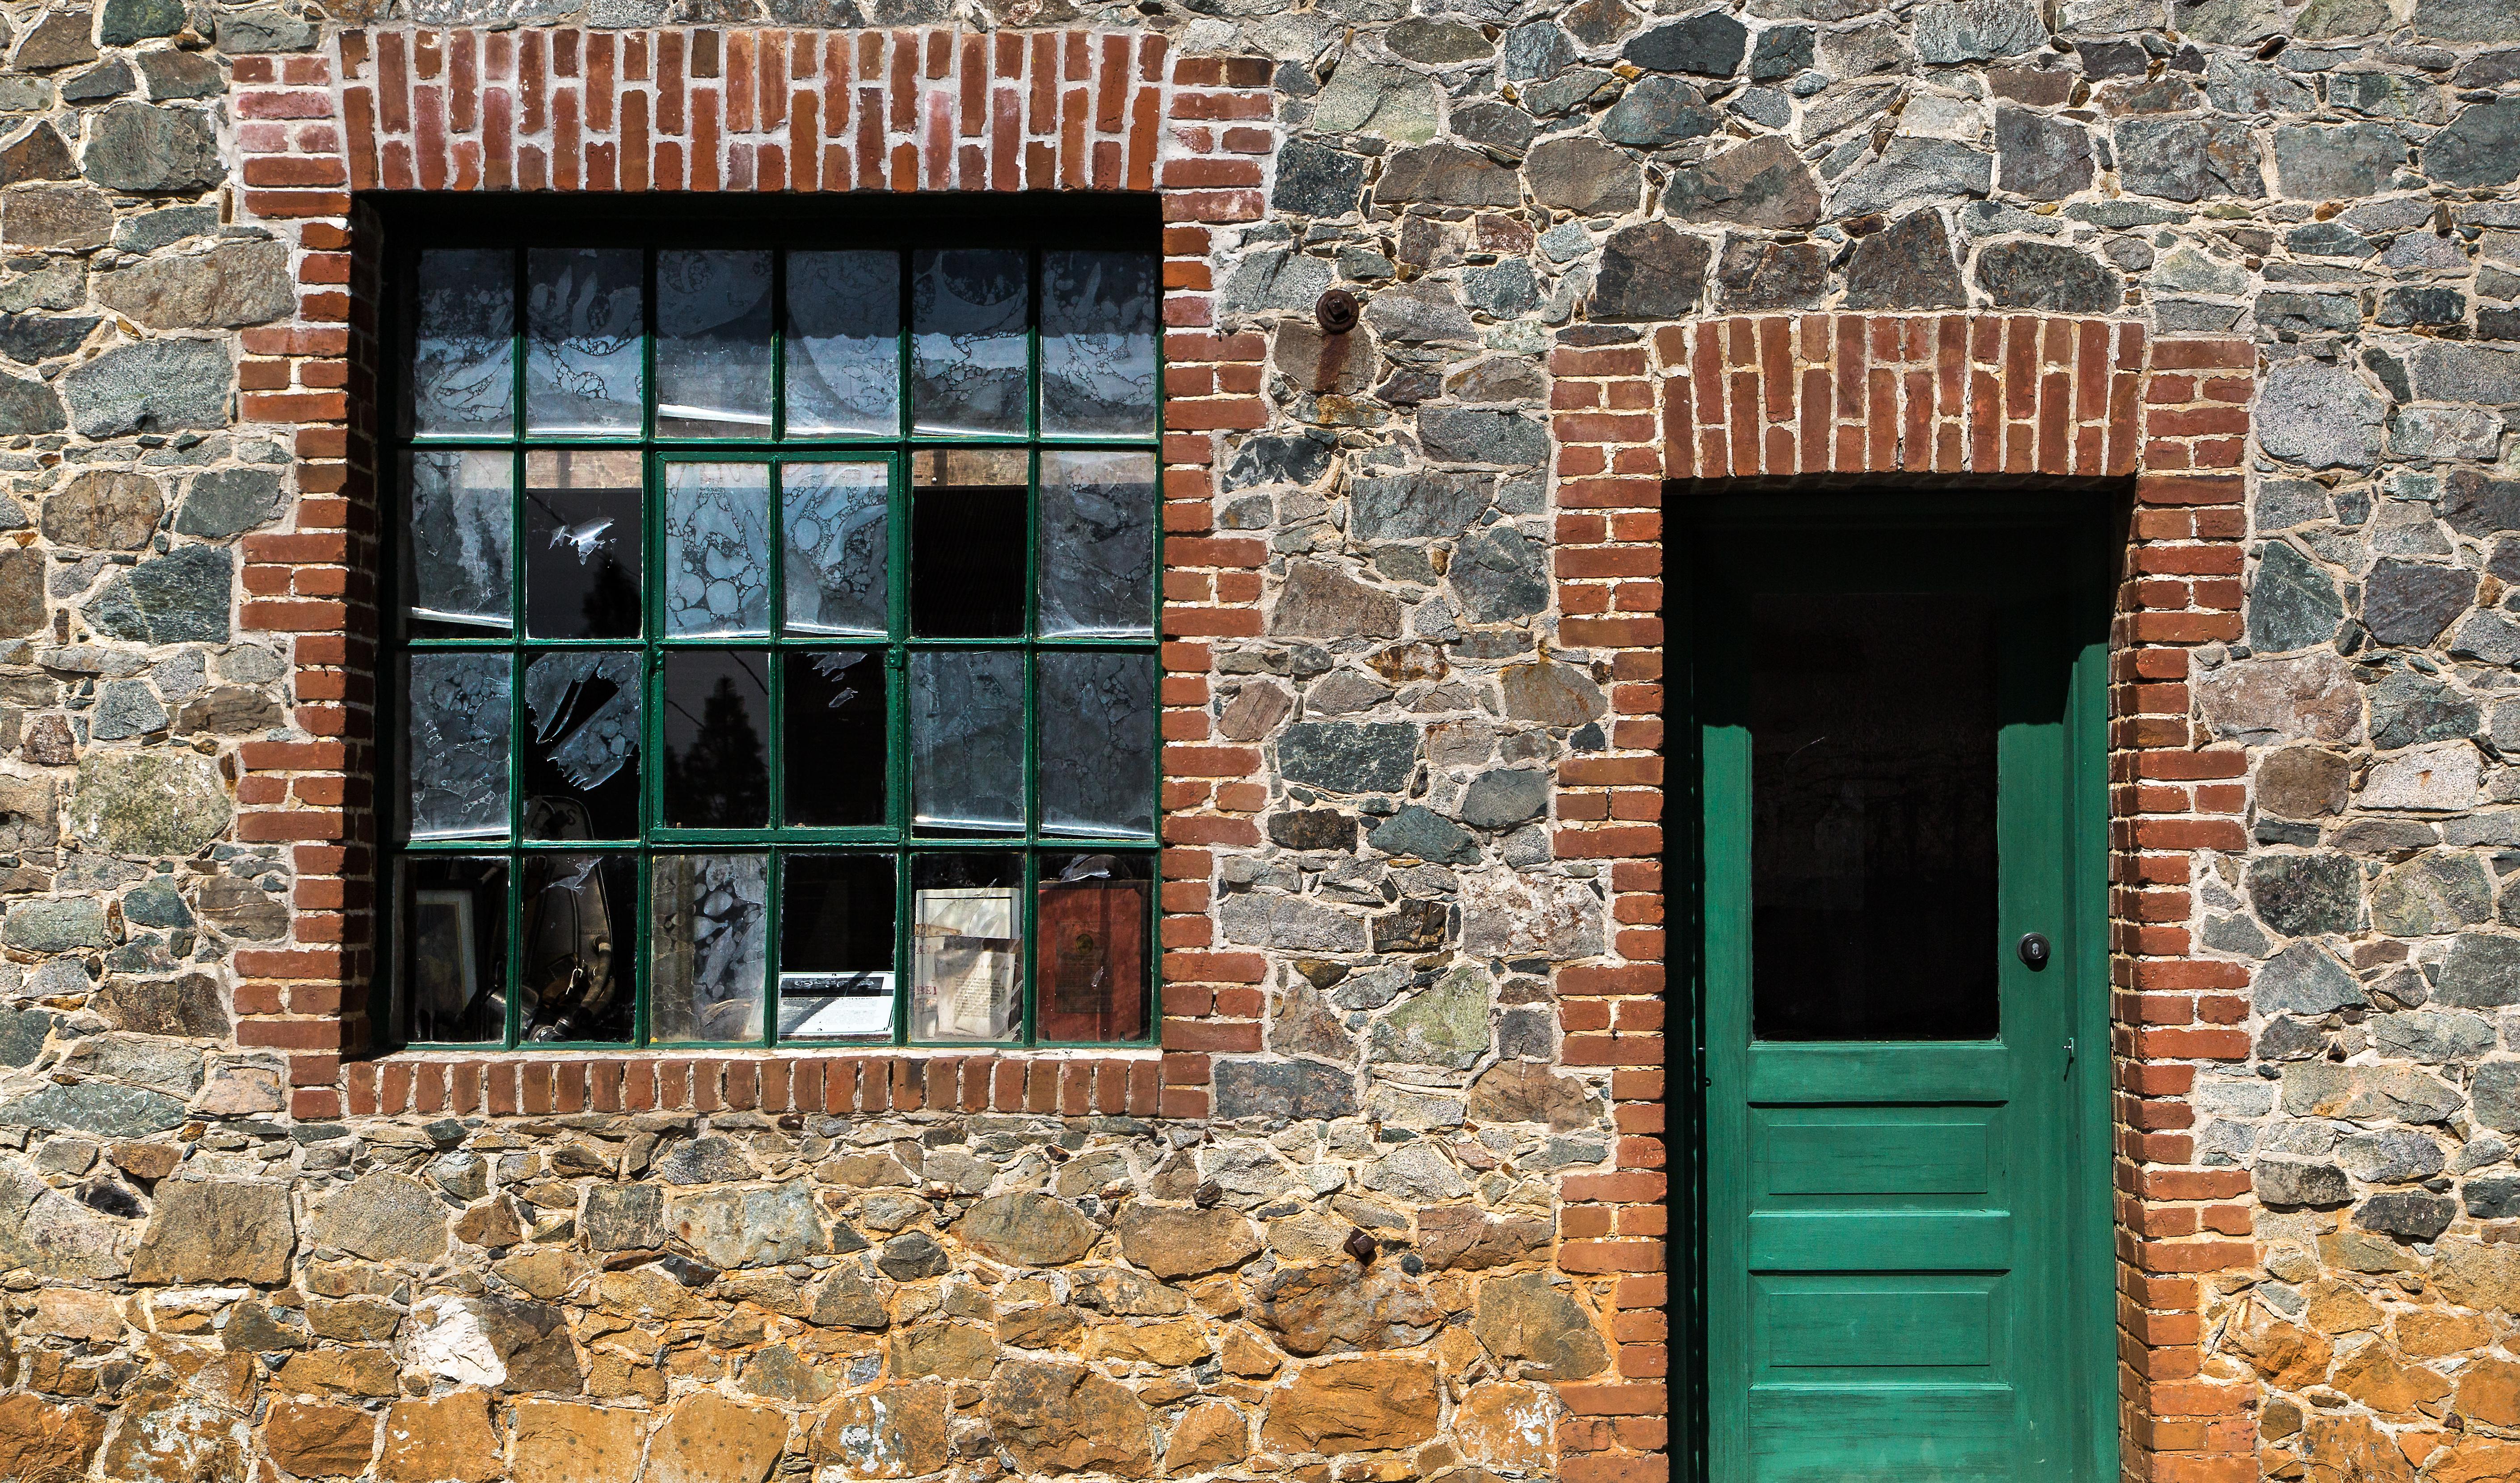 Fotos gratis : arquitectura, madera, casa, ventana, vaso, edificio ...